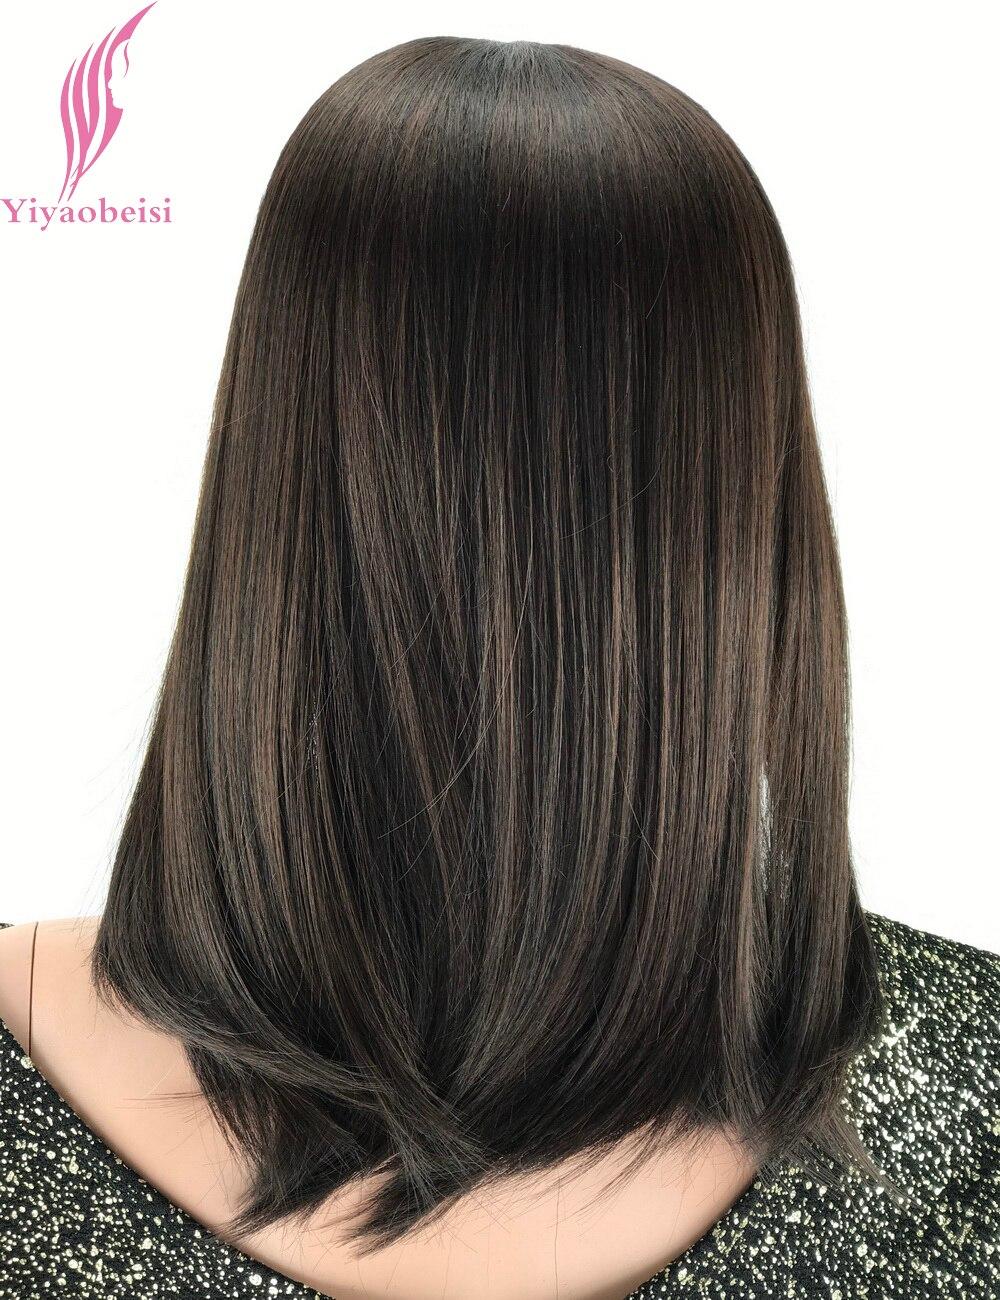 Highlights To Black Hair 7000 Hair Highlights